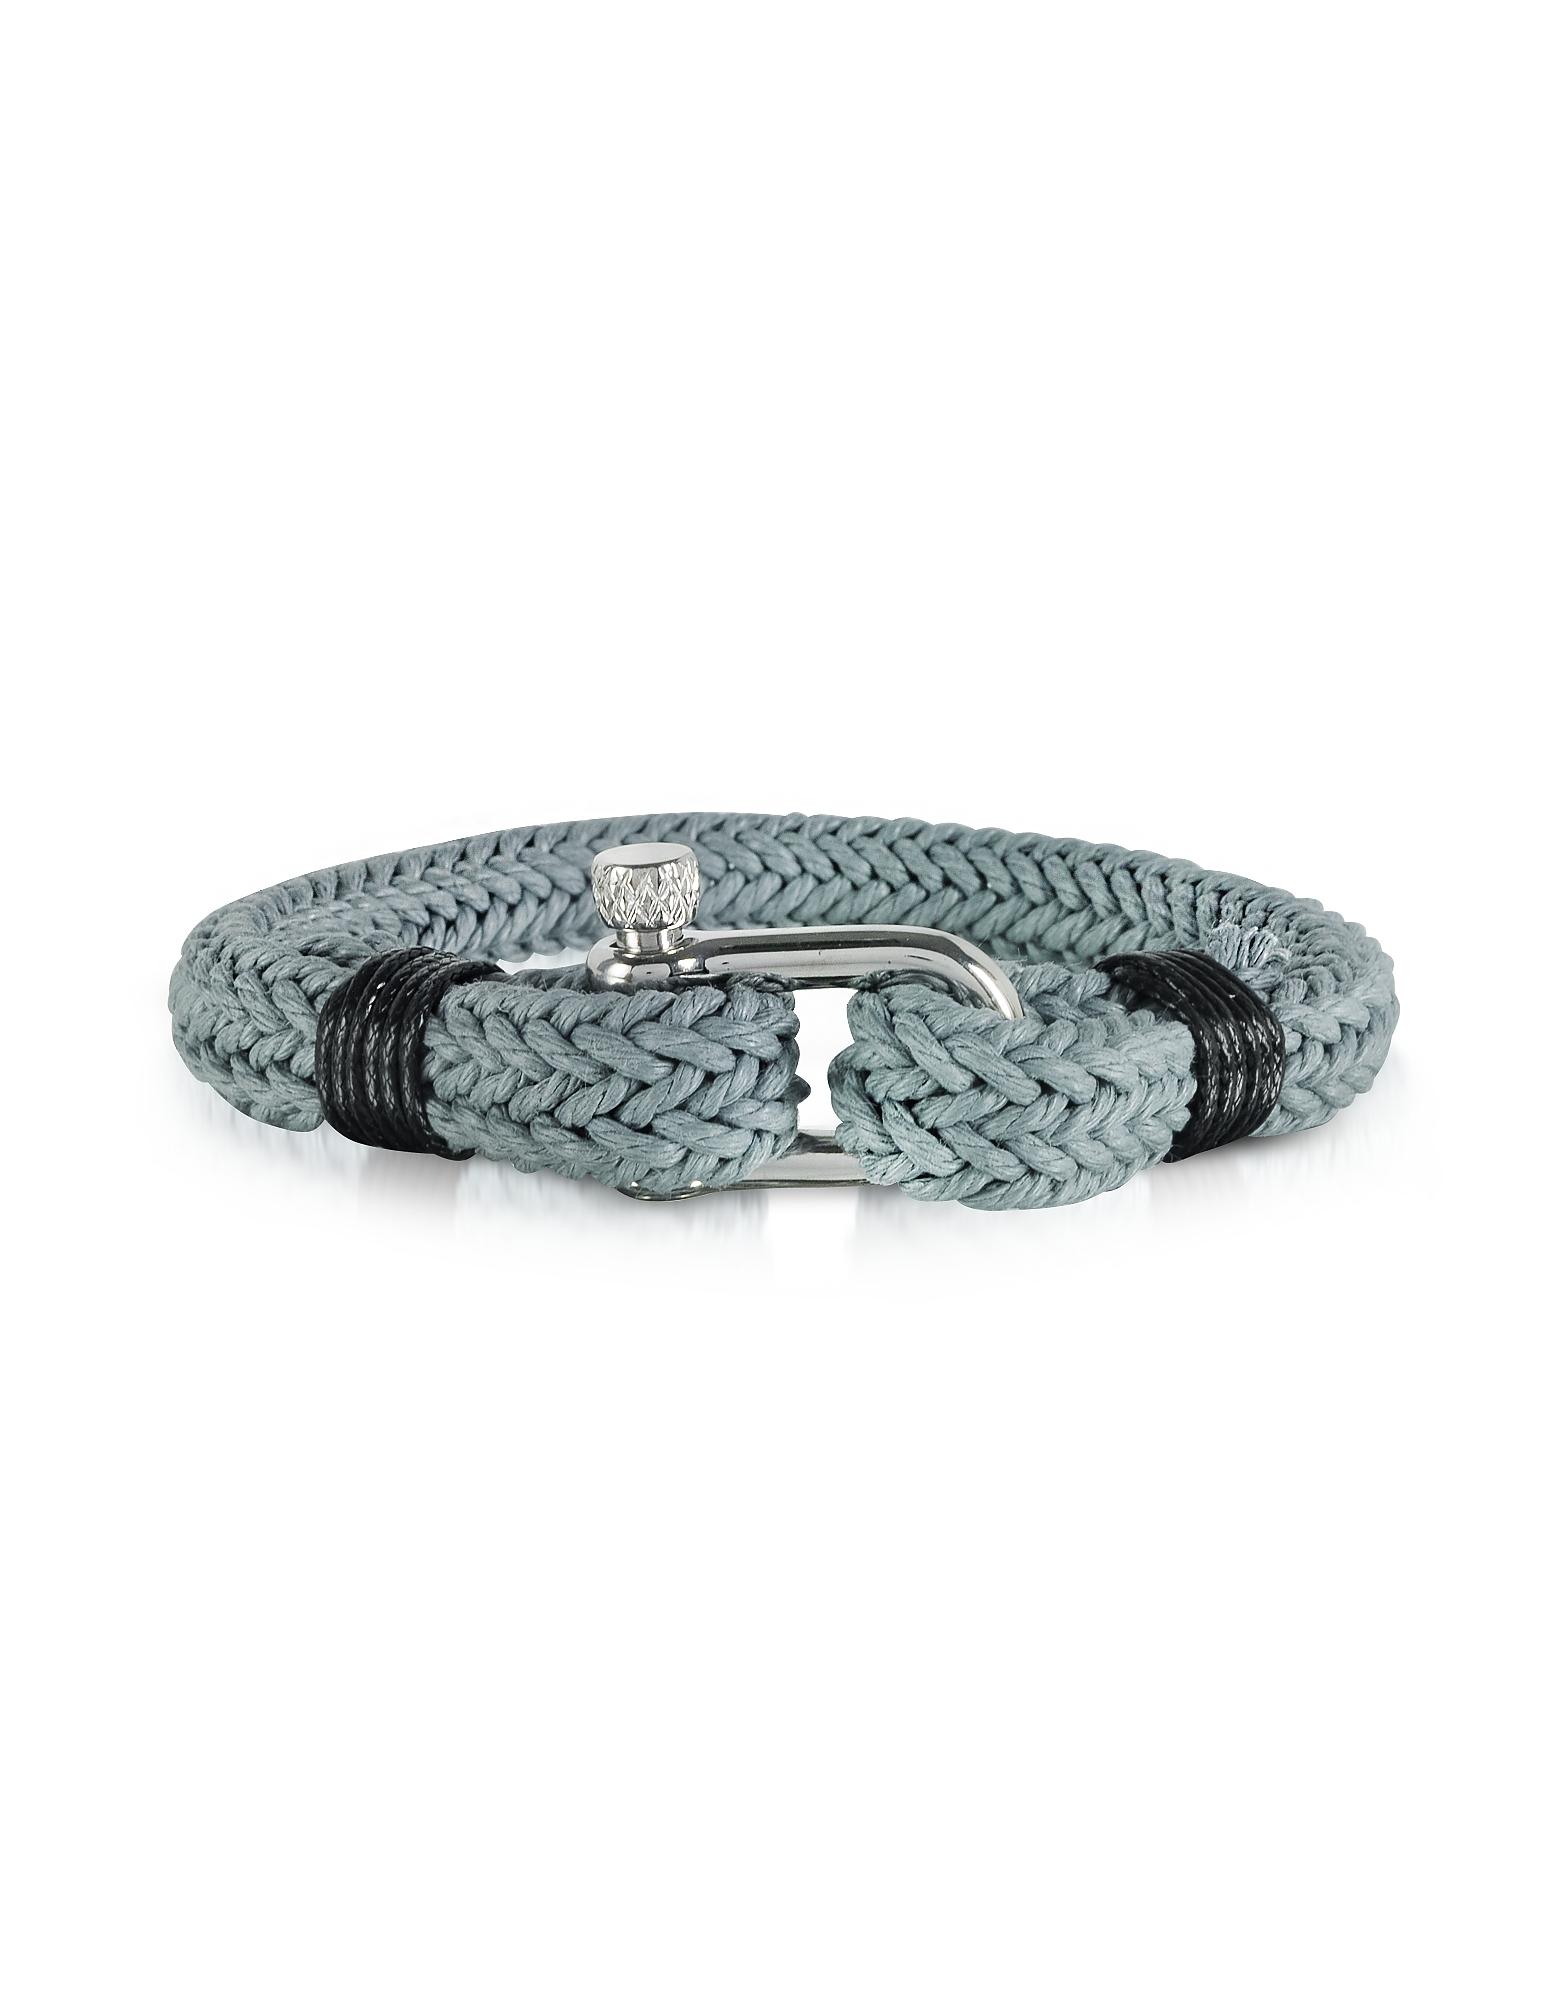 Forzieri Men's Bracelets, Ice Grey Woven Rope Men's Bracelet